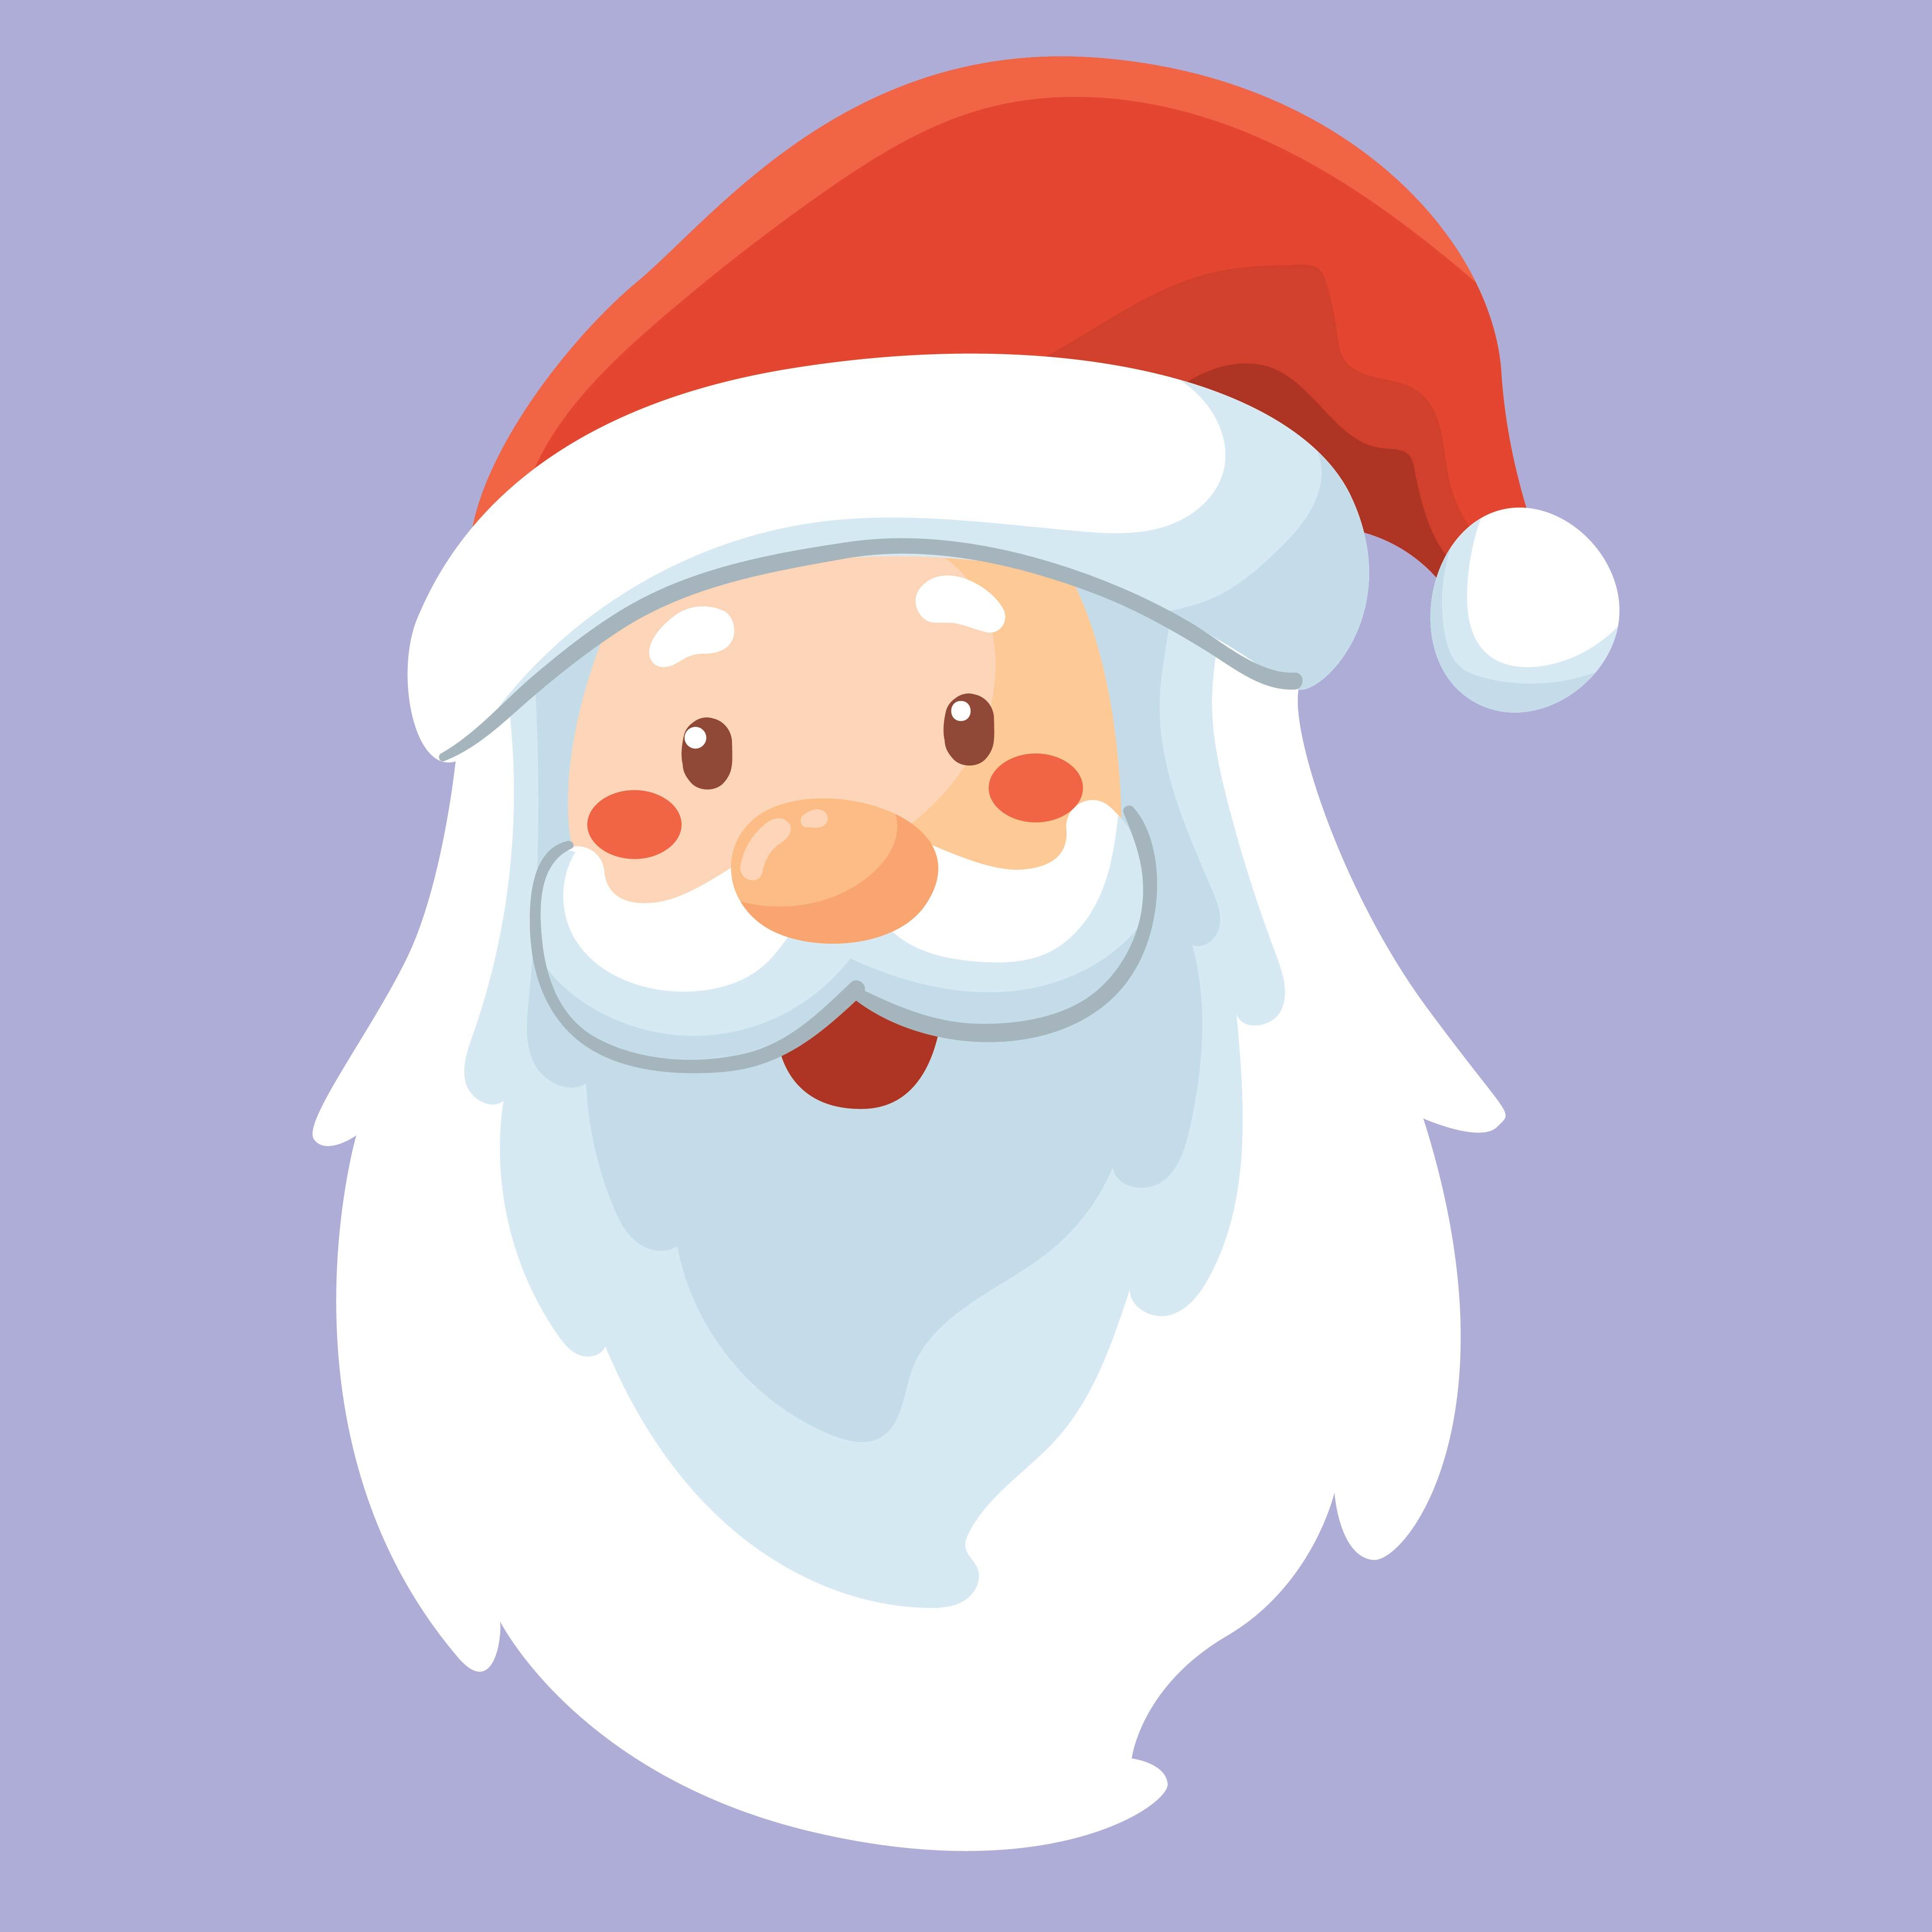 7 Best Santa Claus Face Template Printable - printablee.com